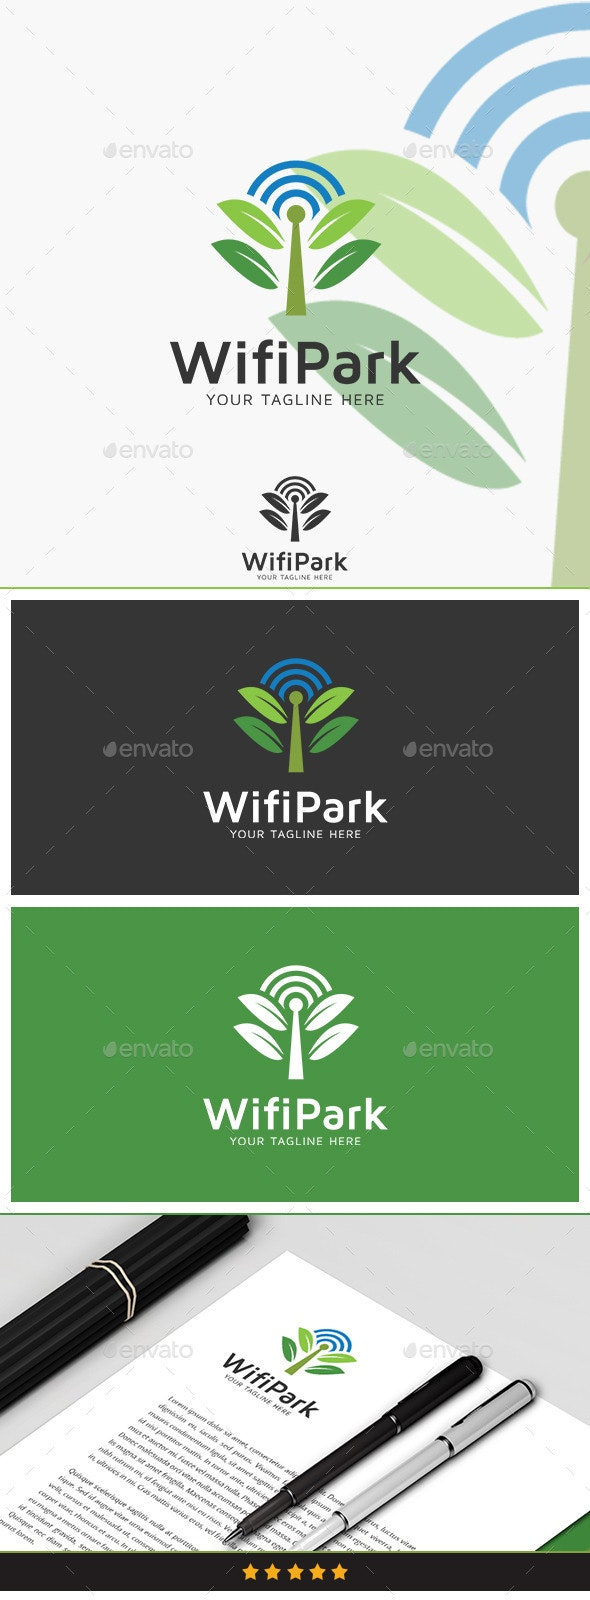 Wifi Park Logo - Nature Logo Templates